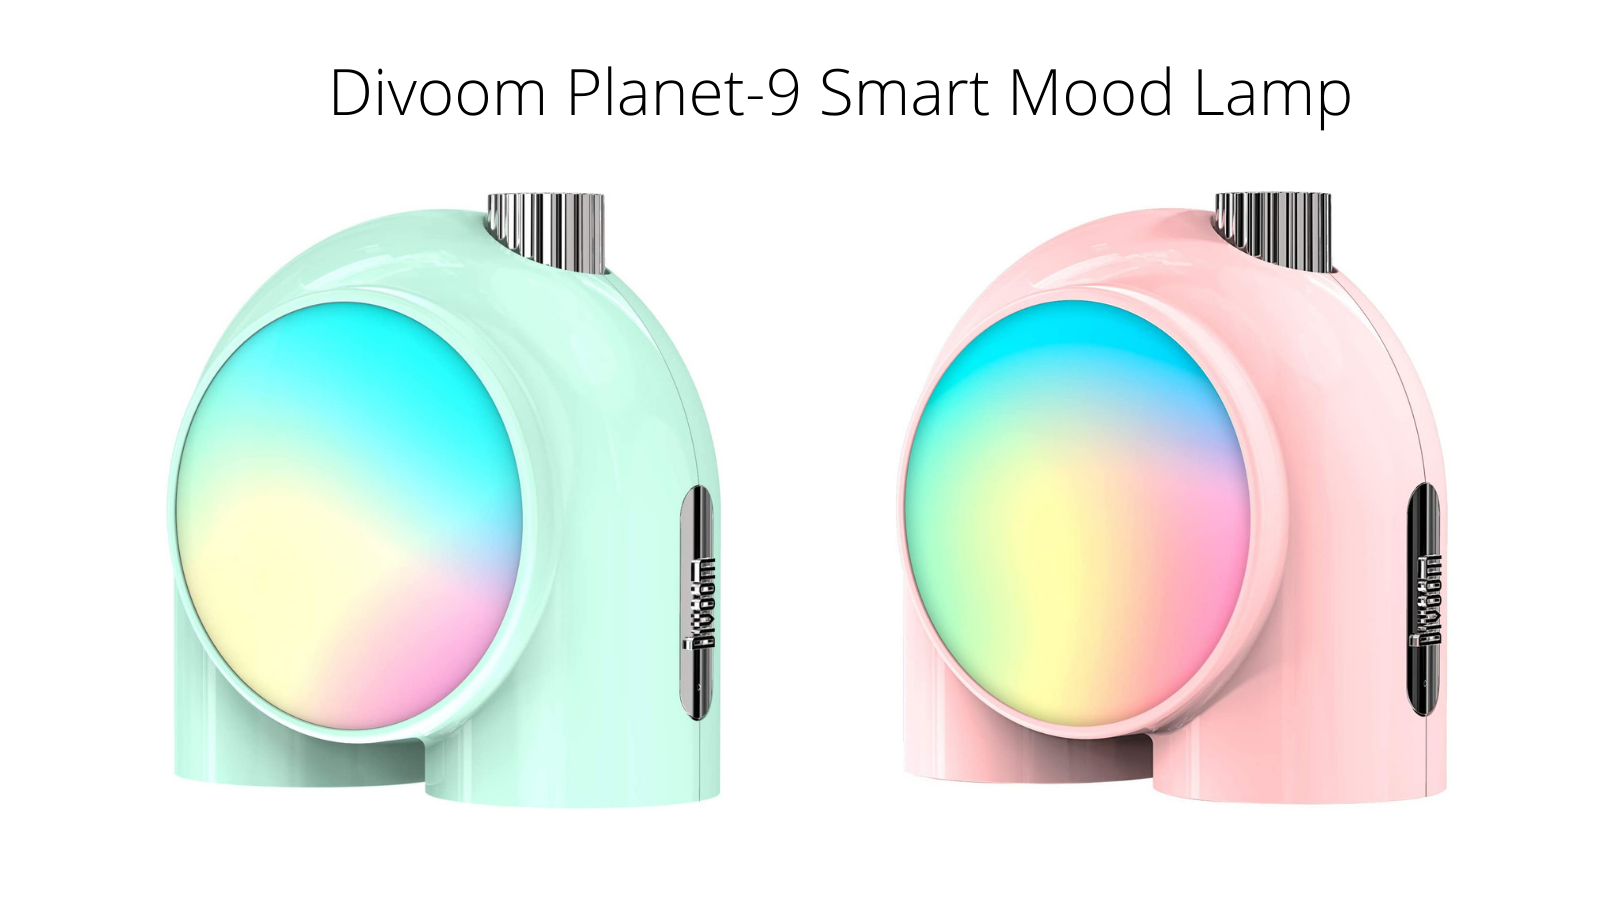 Divoom Planet-9 Smart Mood Lamp